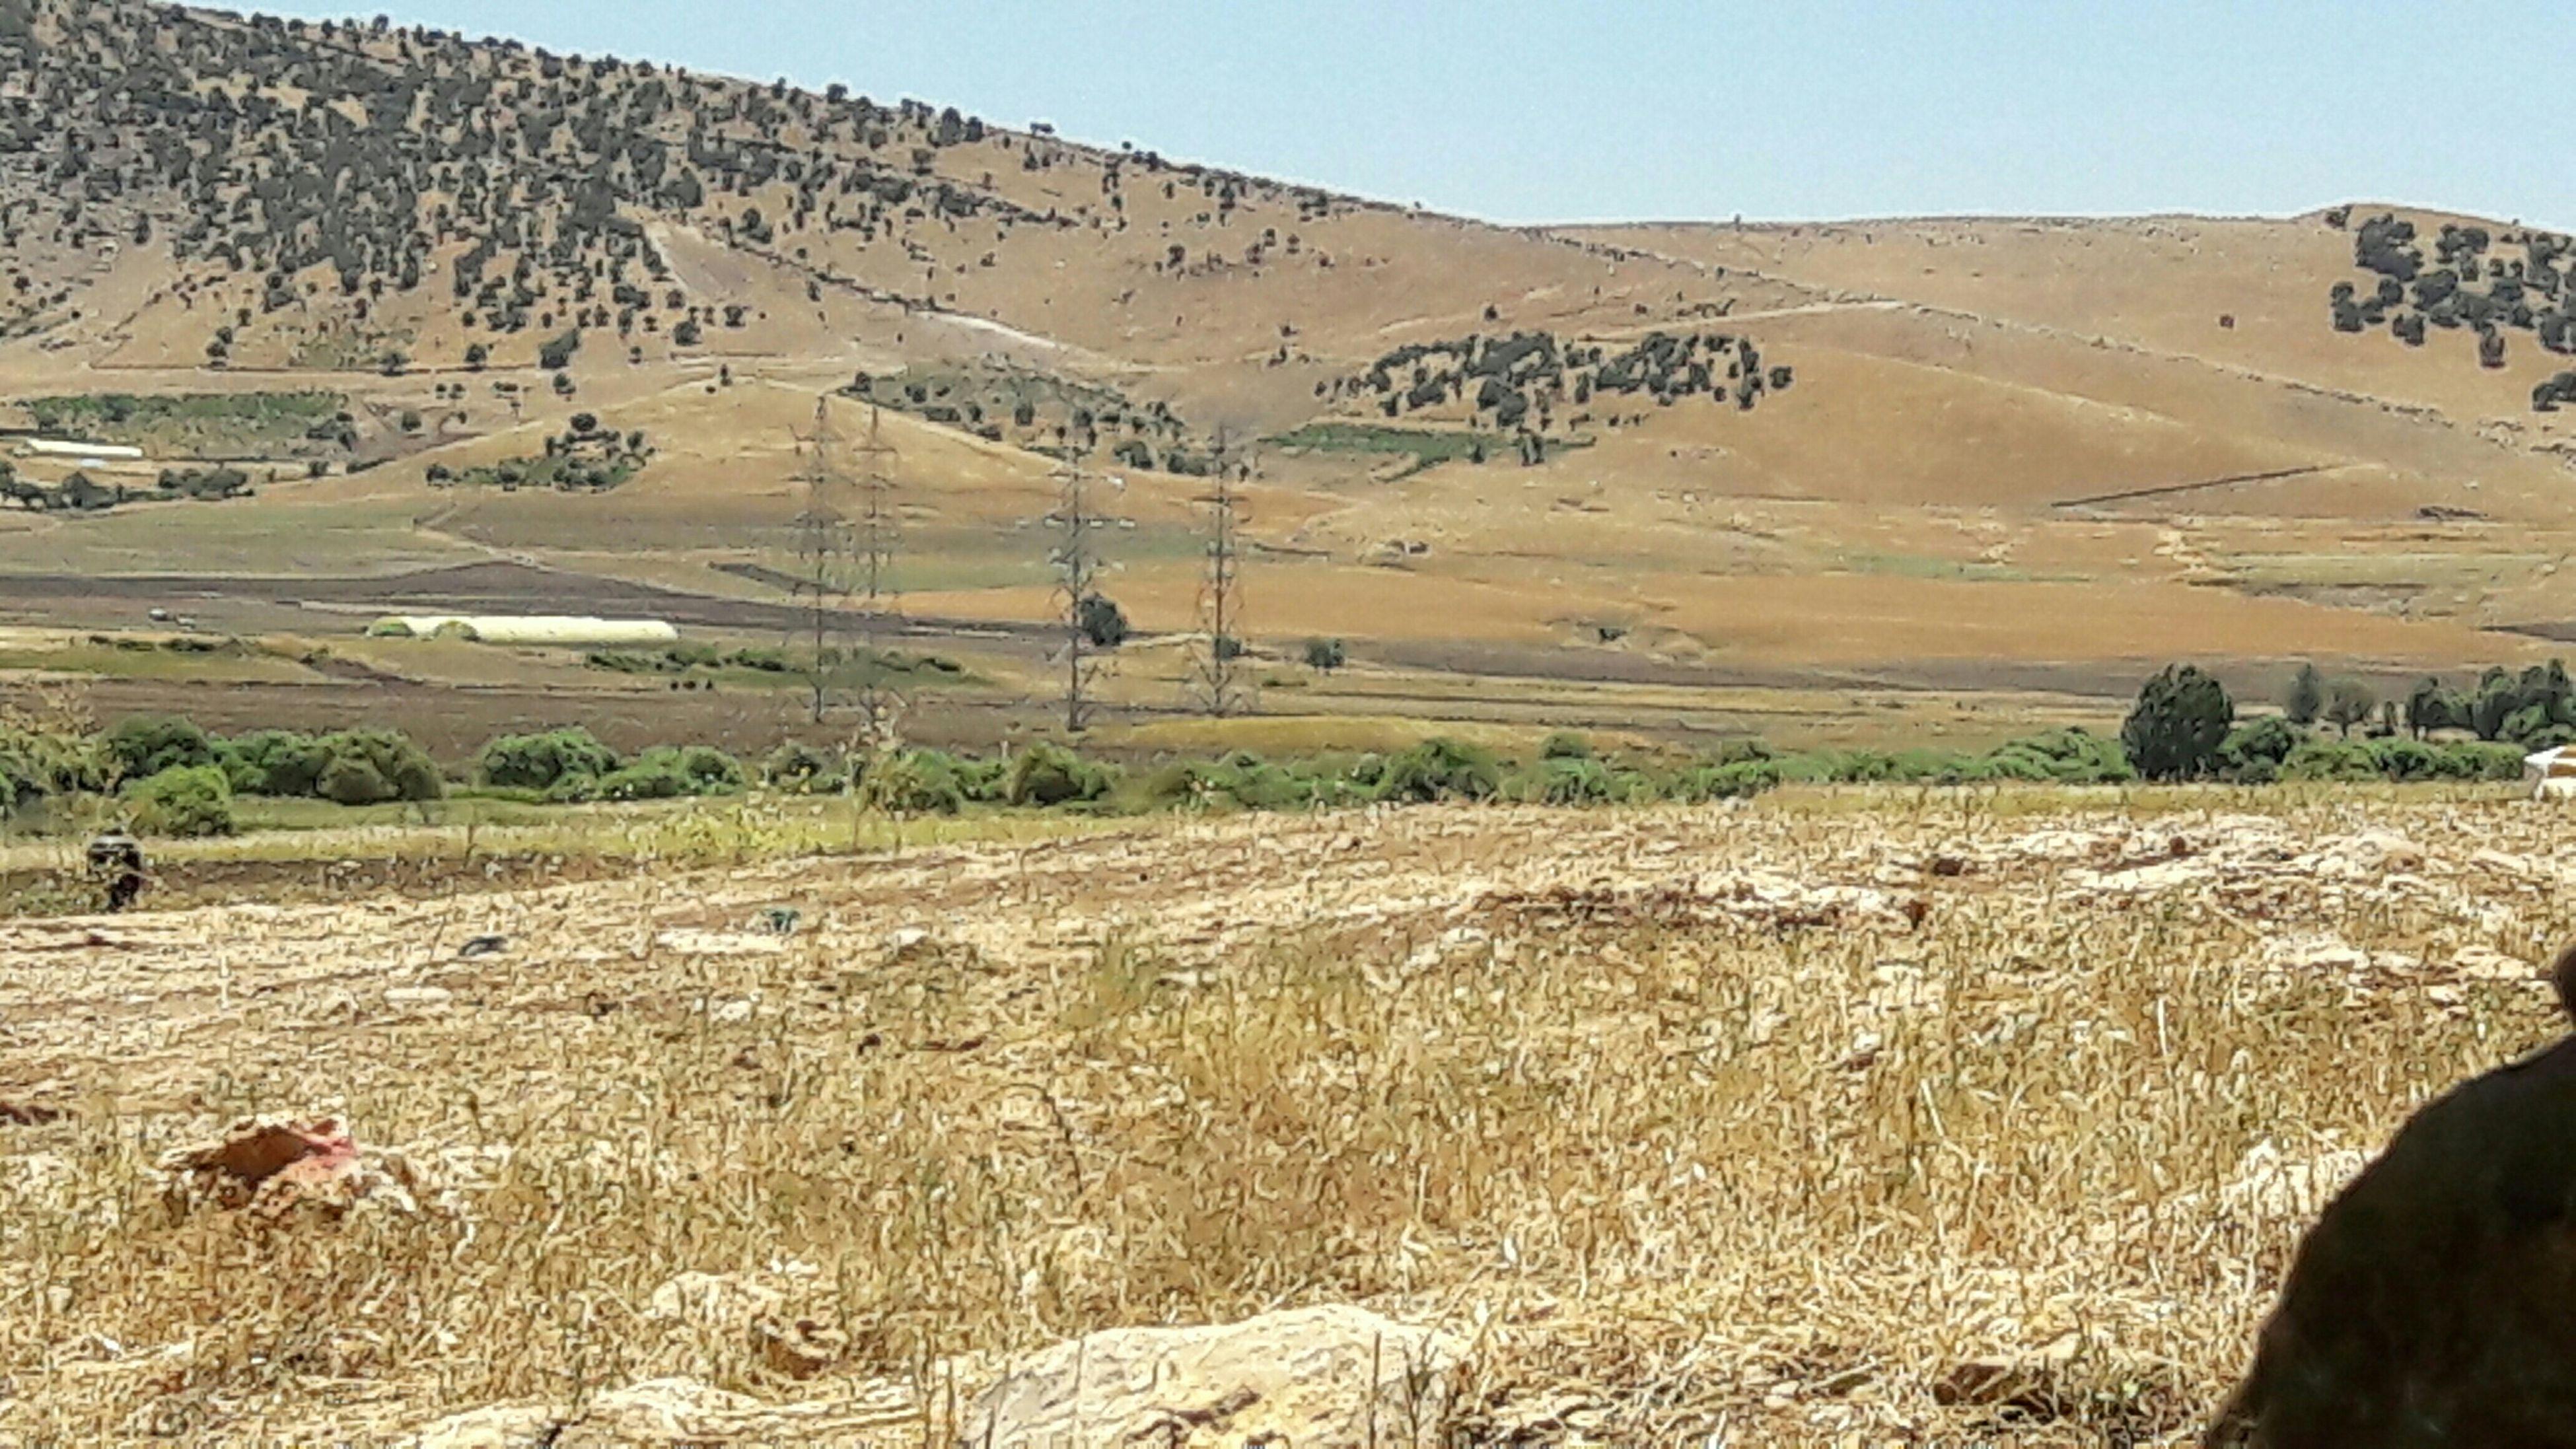 landscape, desert, tranquil scene, tranquility, arid climate, clear sky, nature, scenics, non-urban scene, mountain, remote, beauty in nature, barren, sky, field, sunlight, day, horizon over land, sand dune, sand